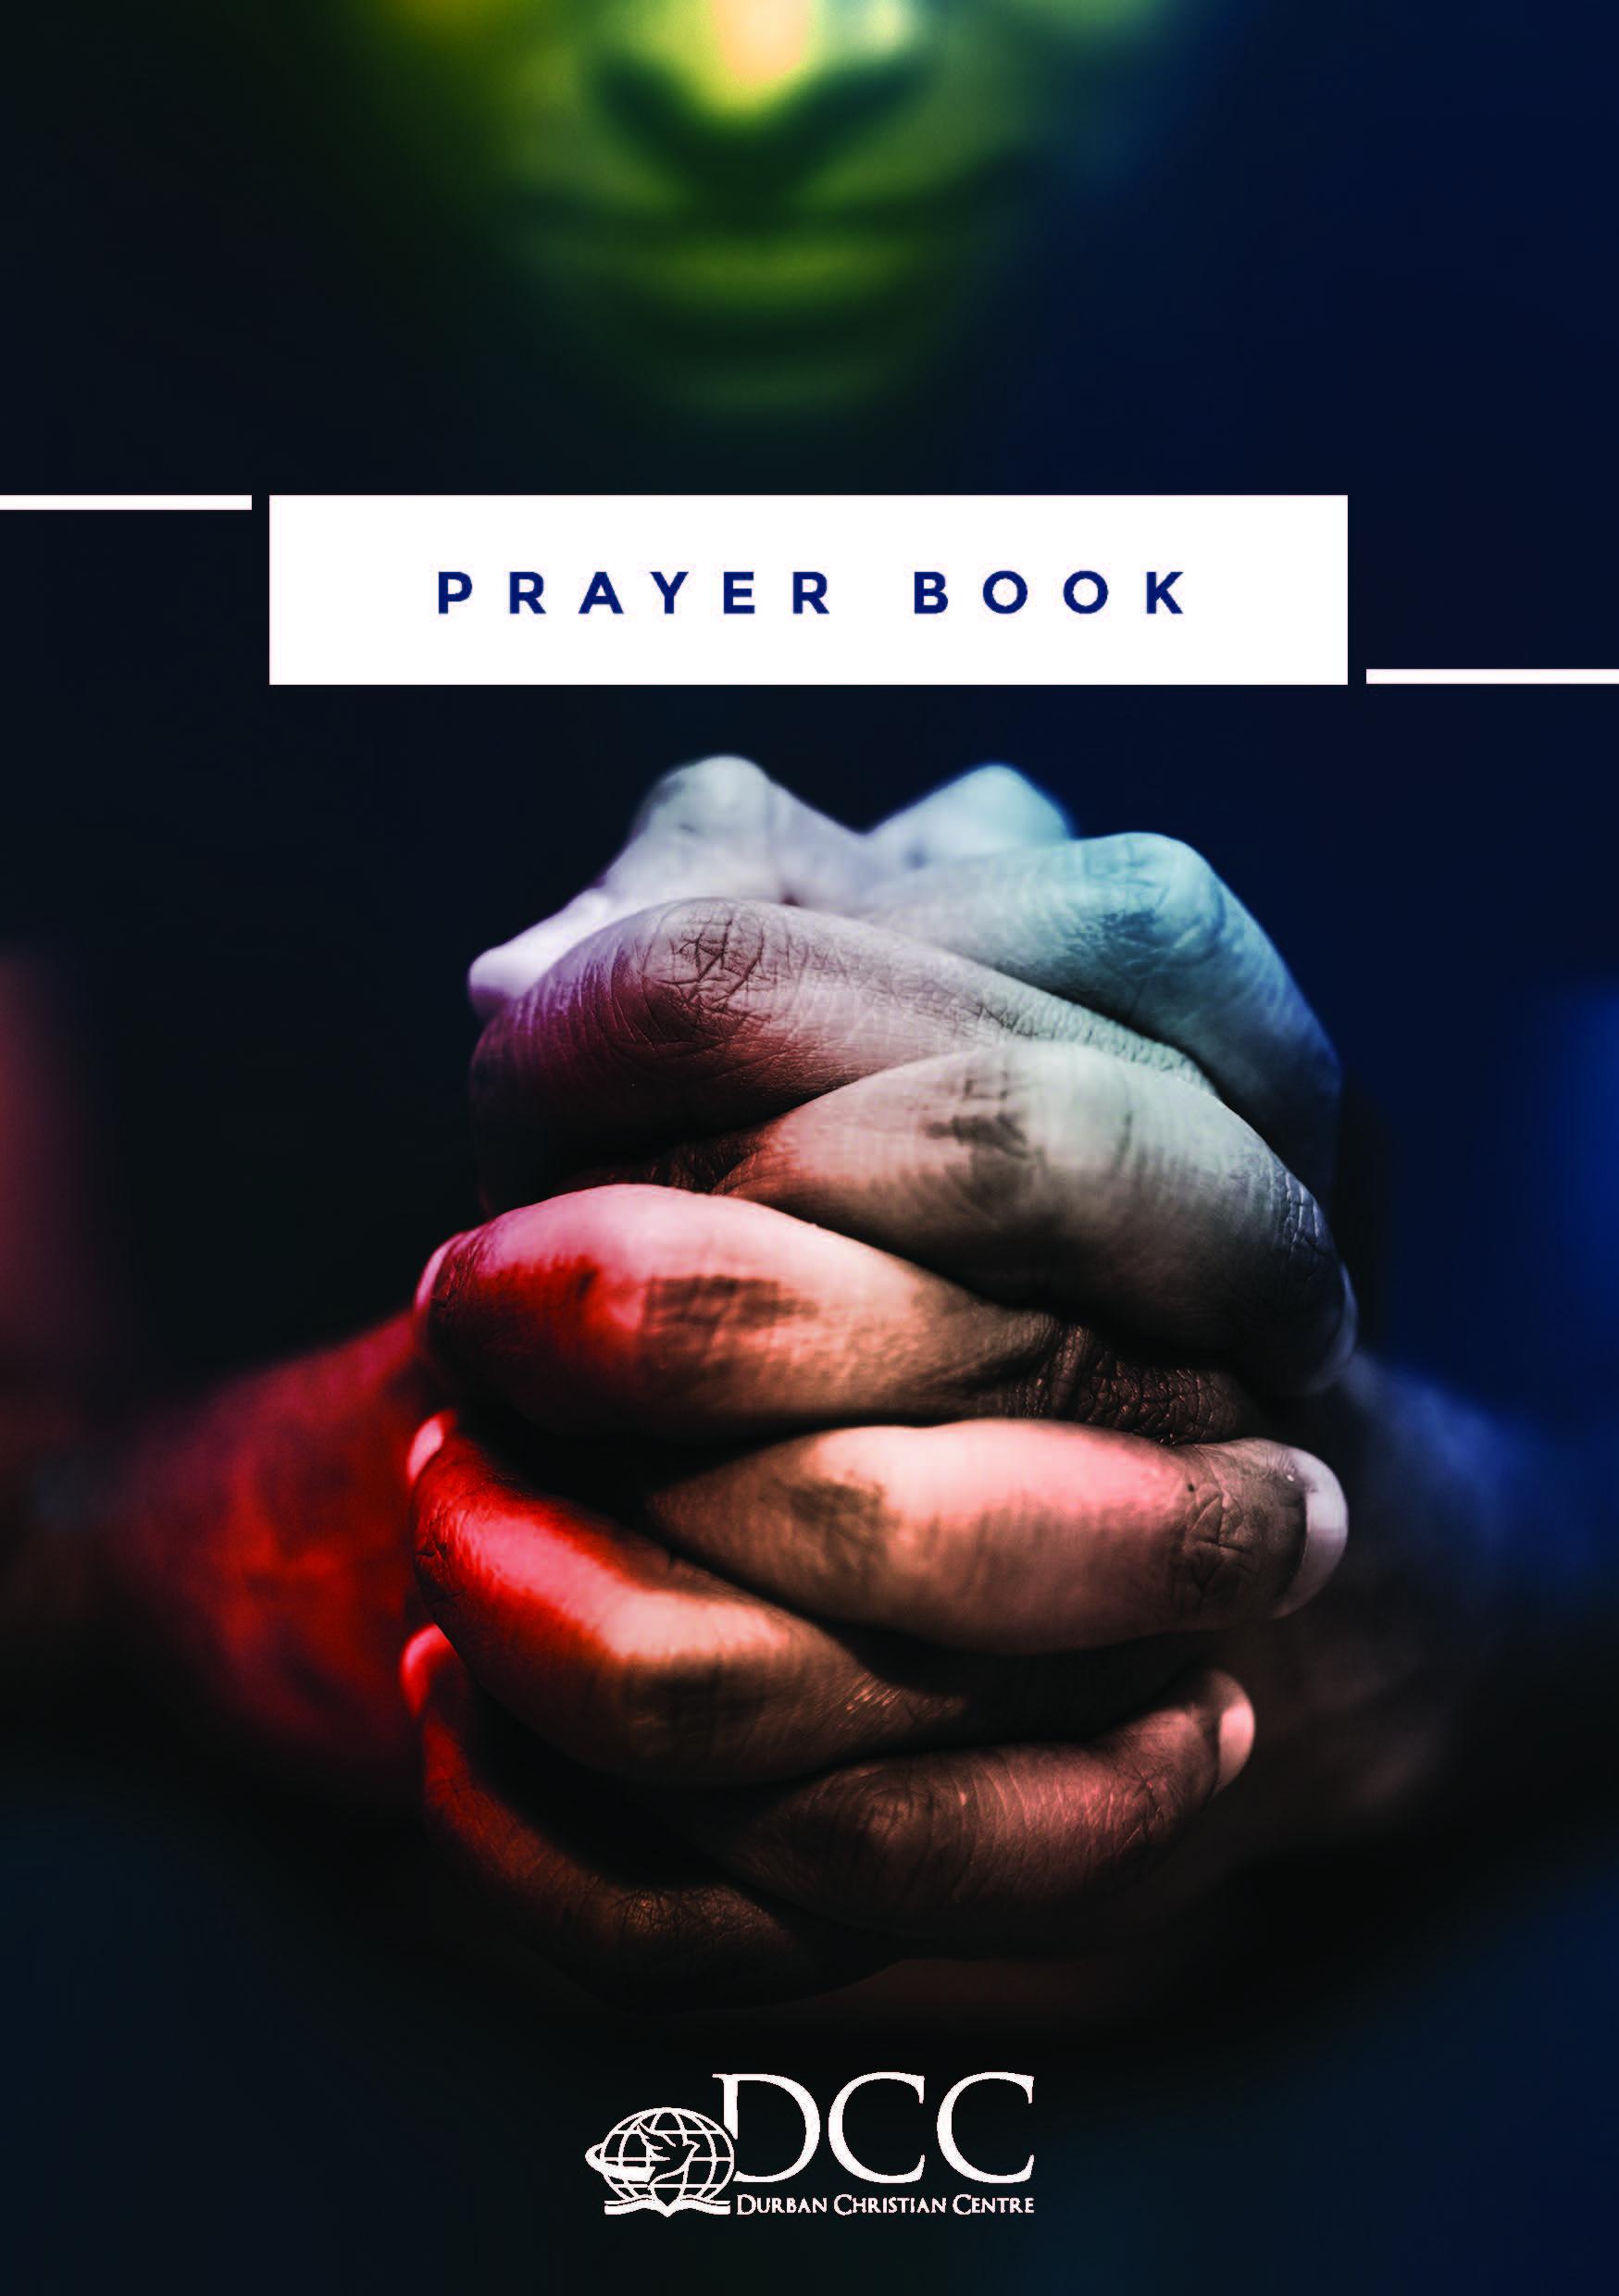 DCC Prayer book 2017_Page_01.jpg